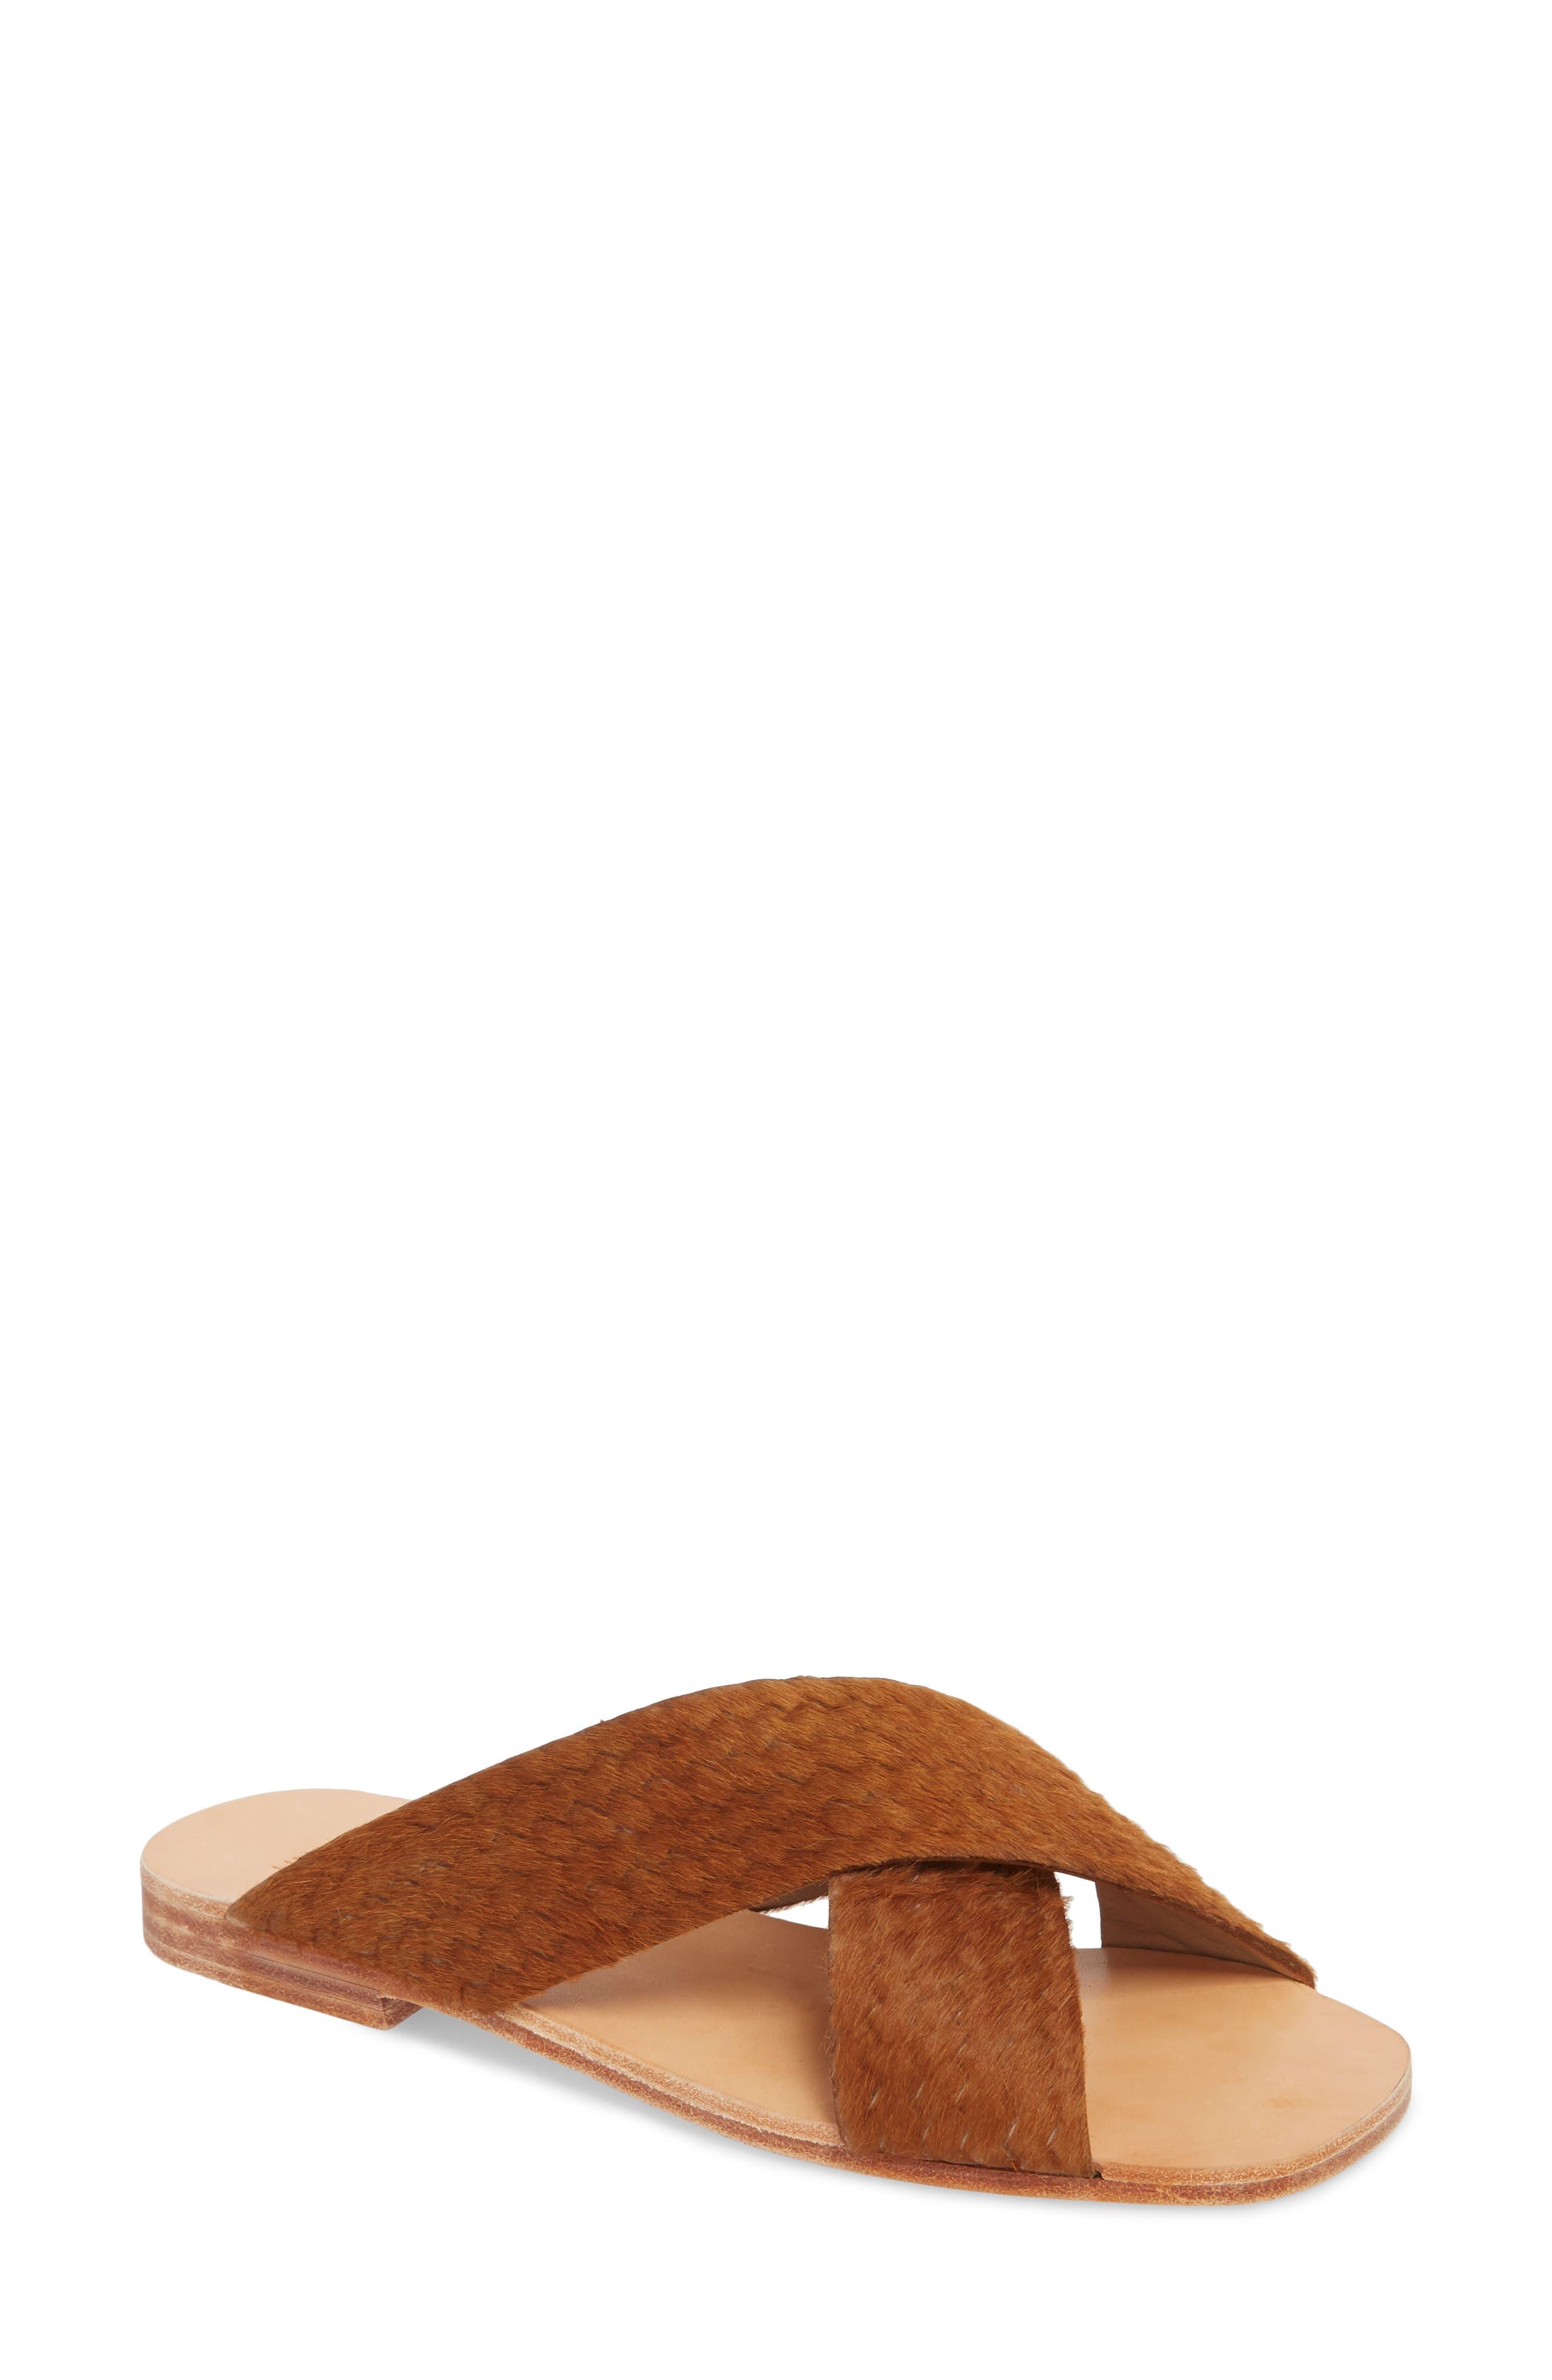 Huma Blanco Odessa Genuine Calf Hair Slide Sandal, Brown